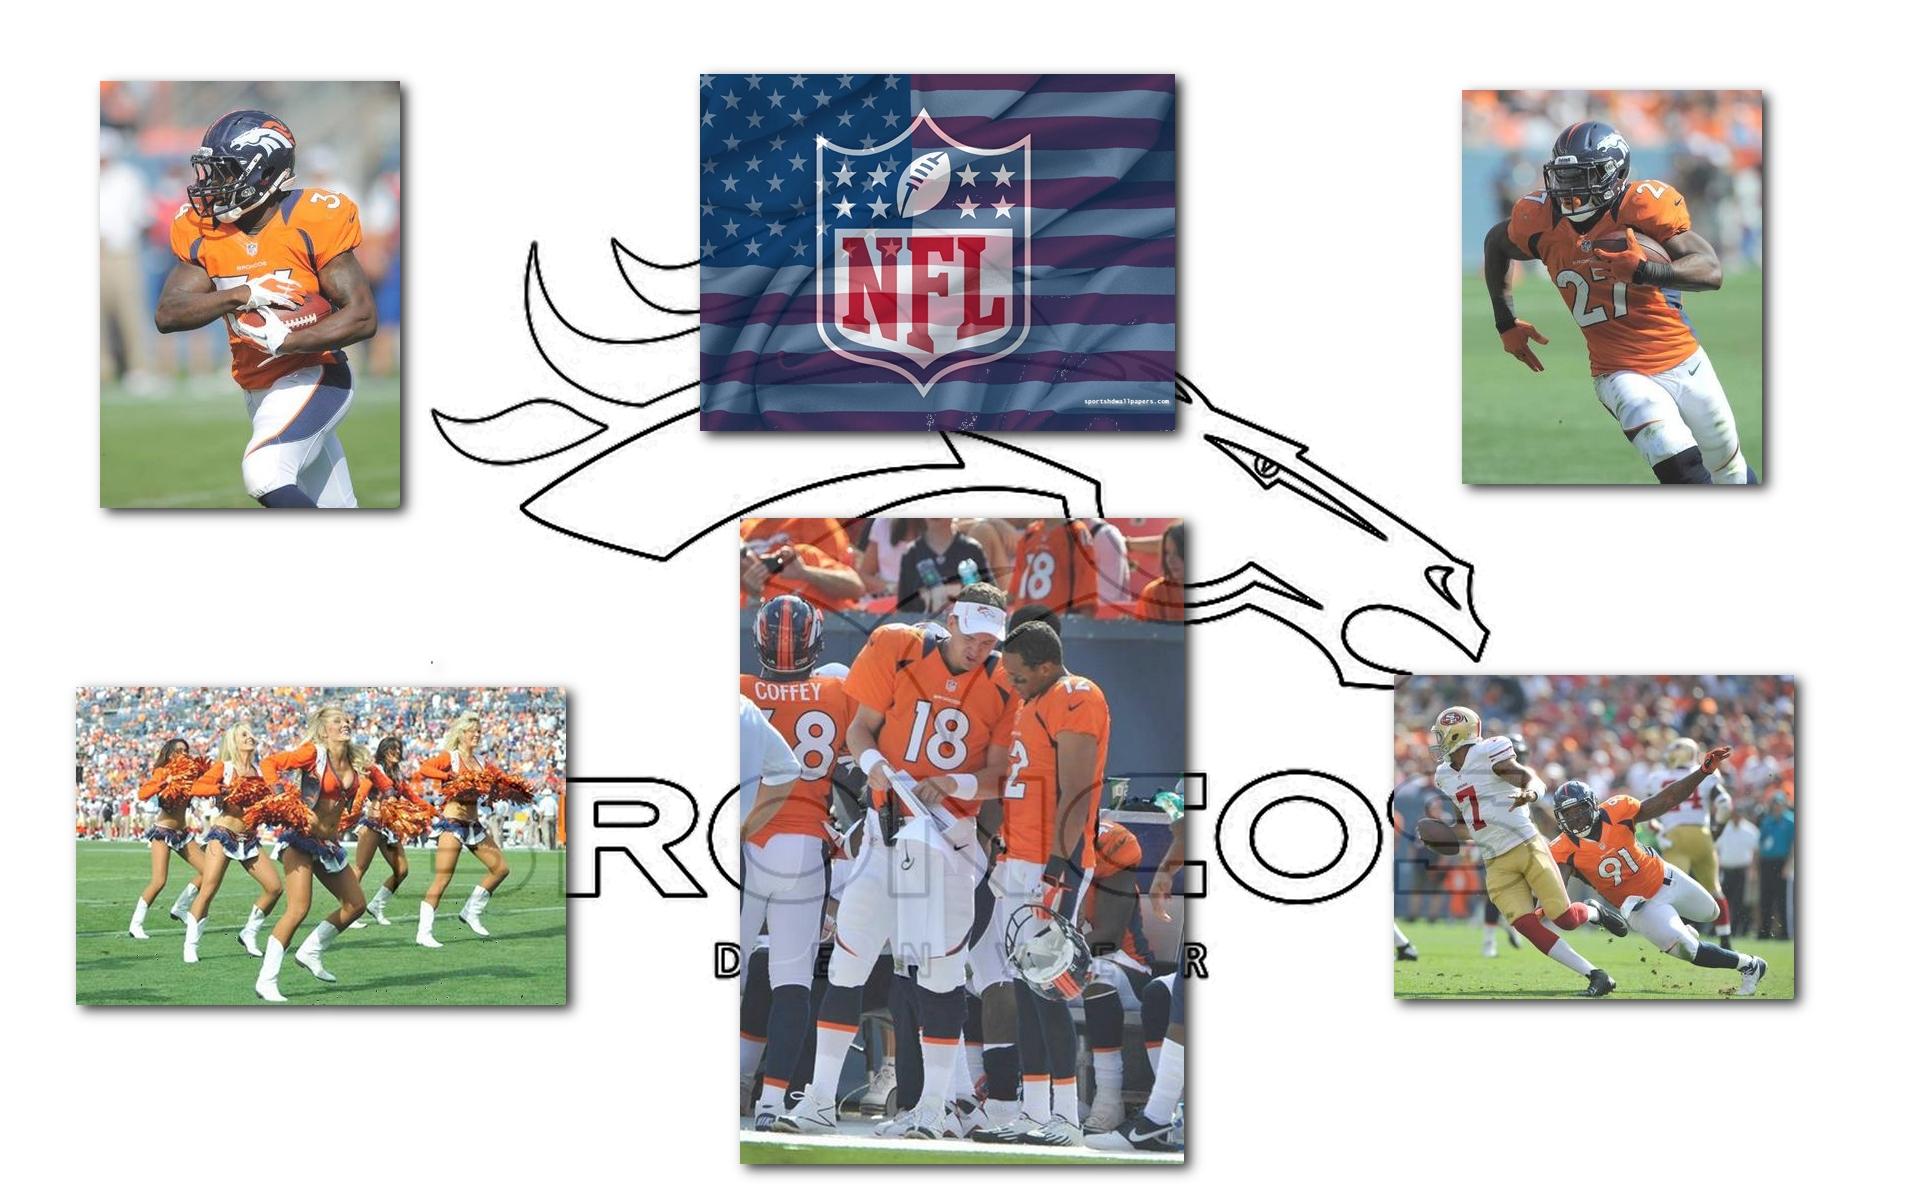 Pin 1920x1200 Denver Broncos Wallpaper Wallpapers Download on 1920x1200